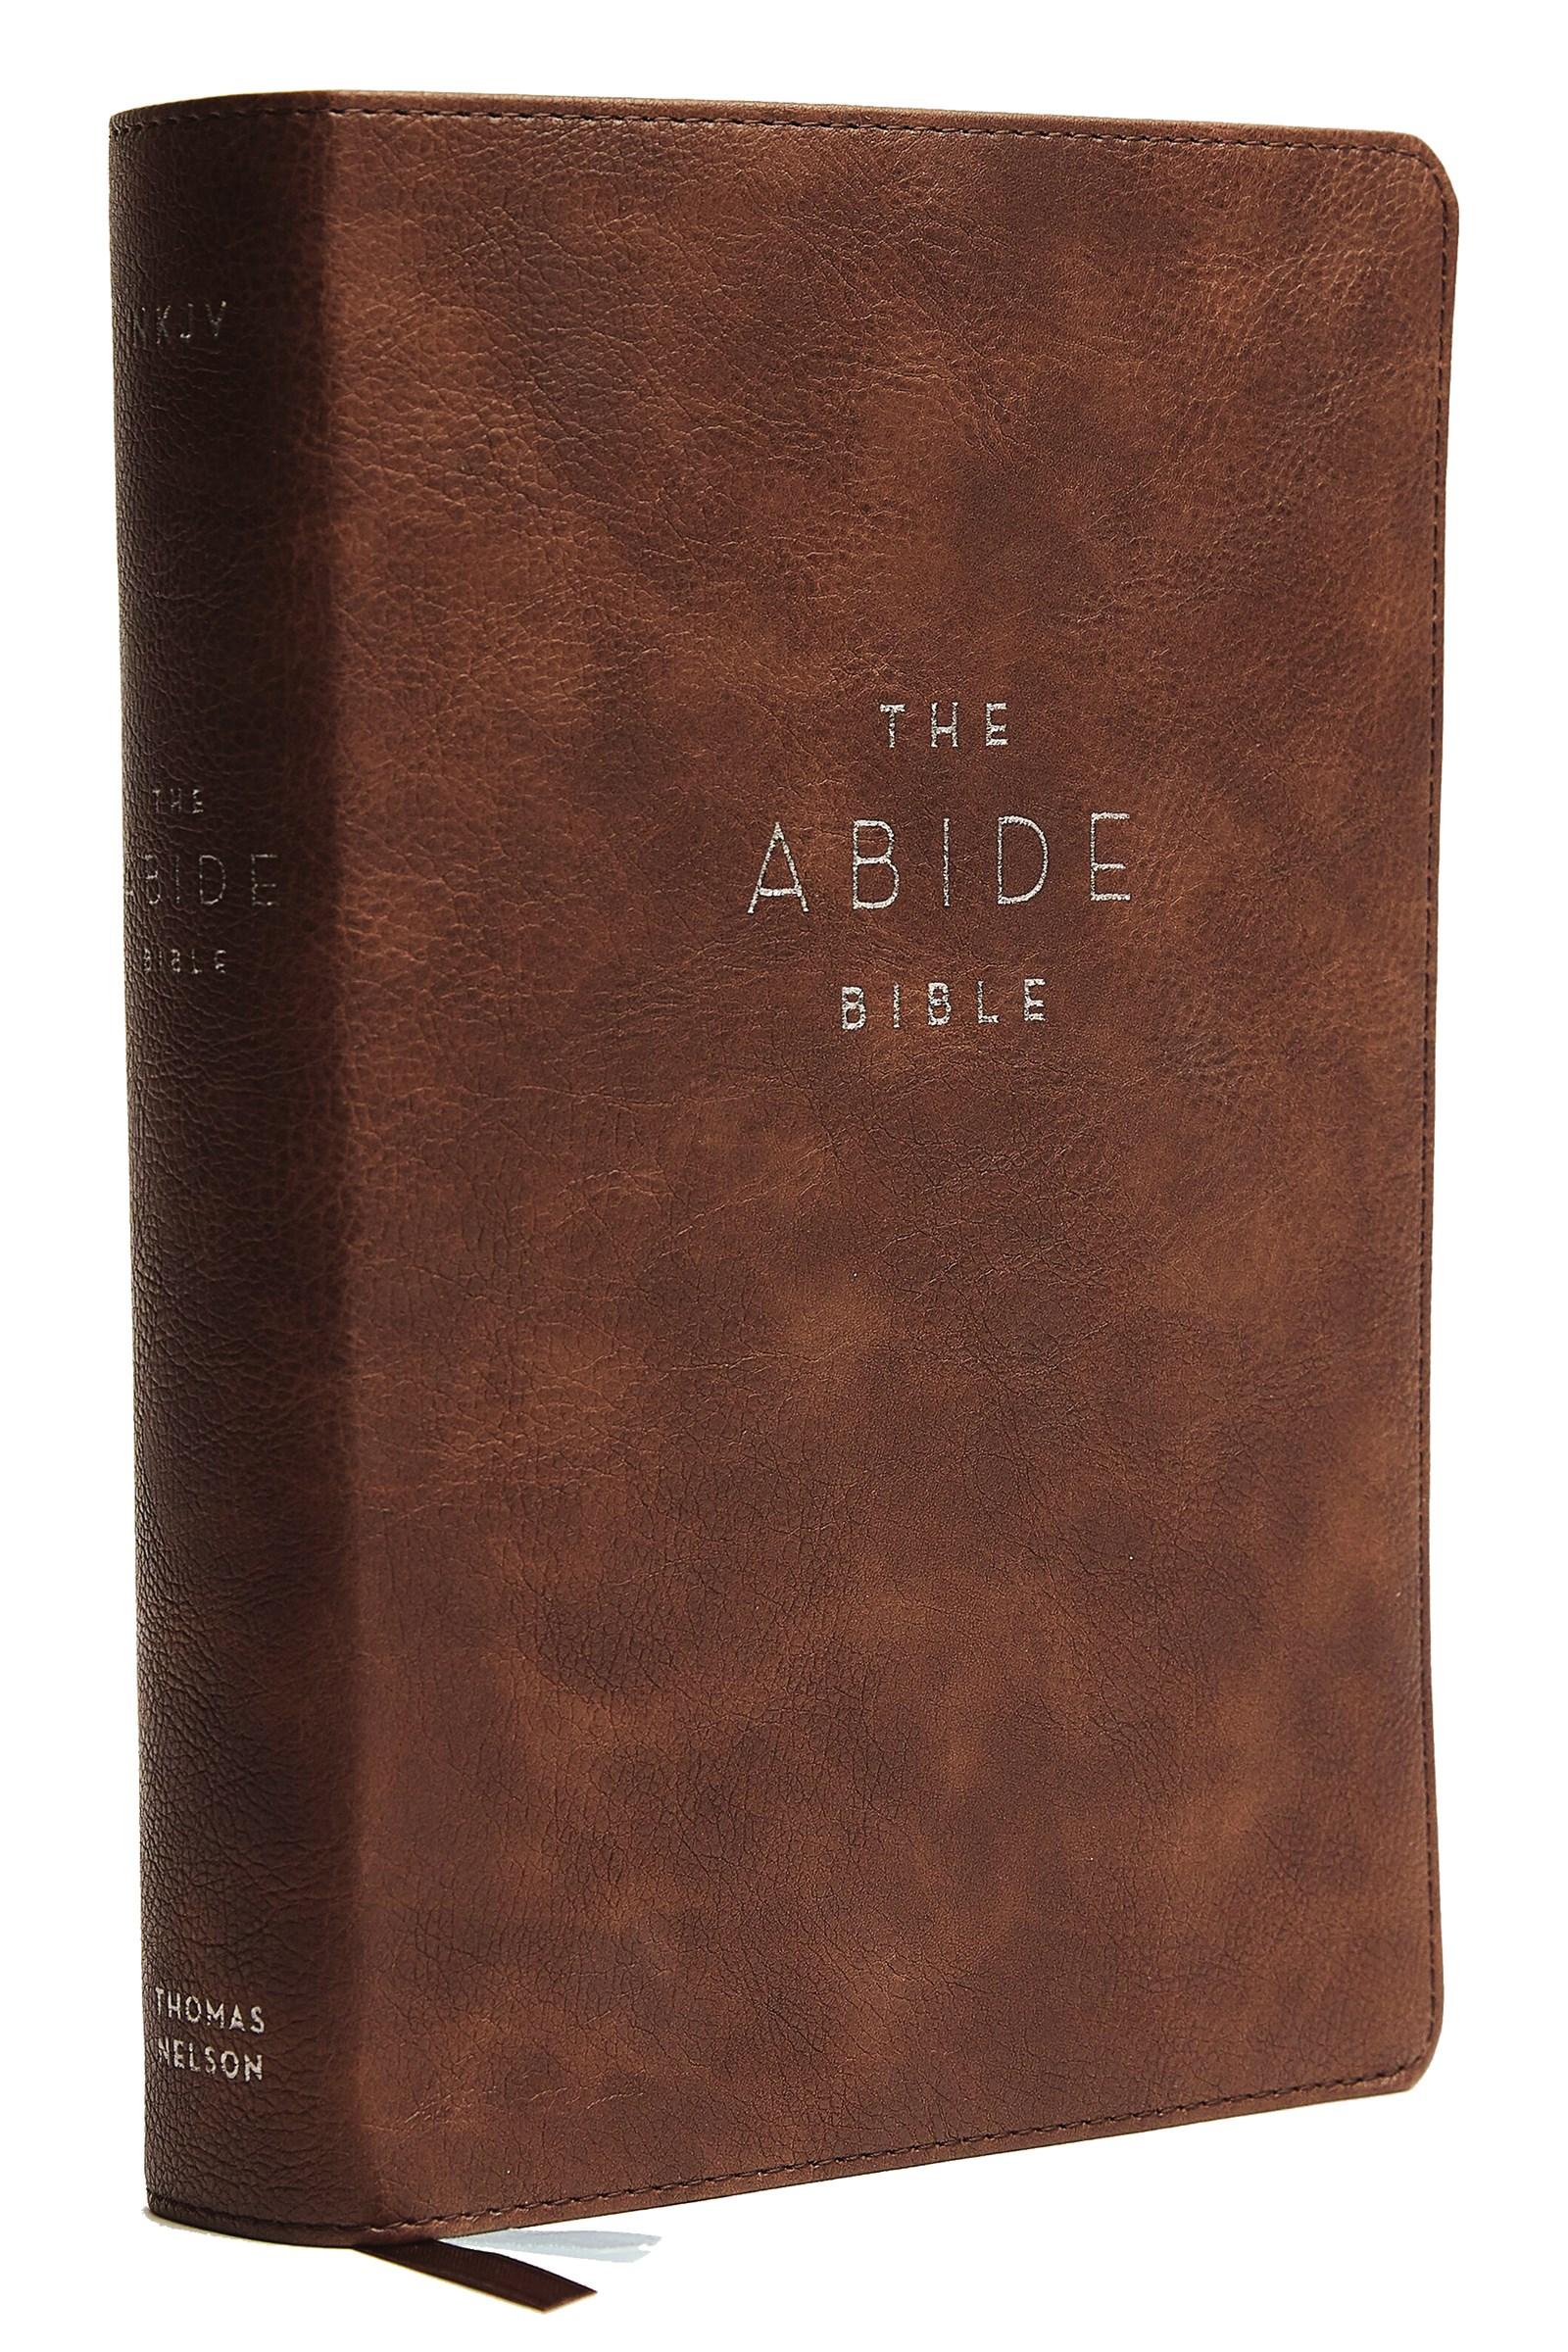 NKJV Abide Bible (Comfort Print)-Brown Leathersoft